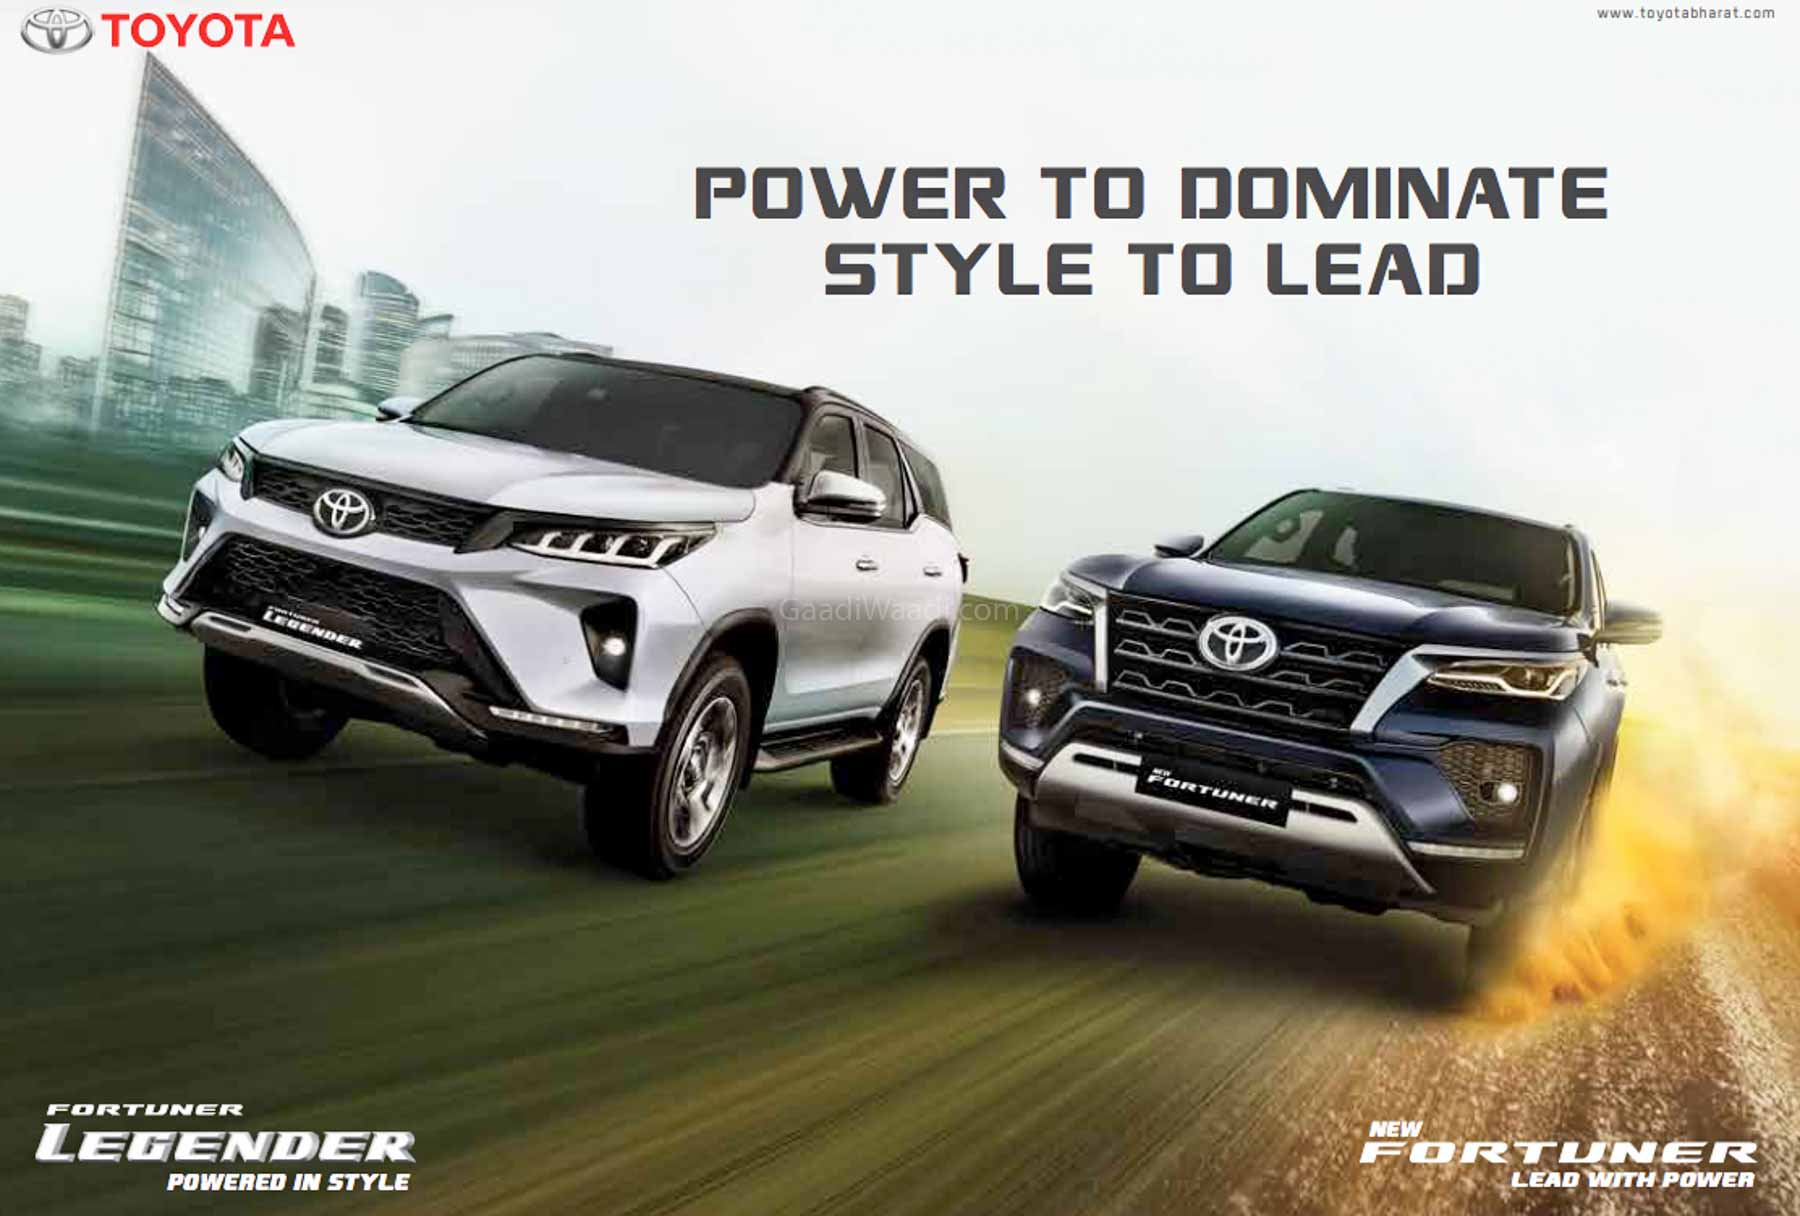 Toyota Fortuner Facelift And Legender Cross 5,000 Bookings In India - GaadiWaadi.com